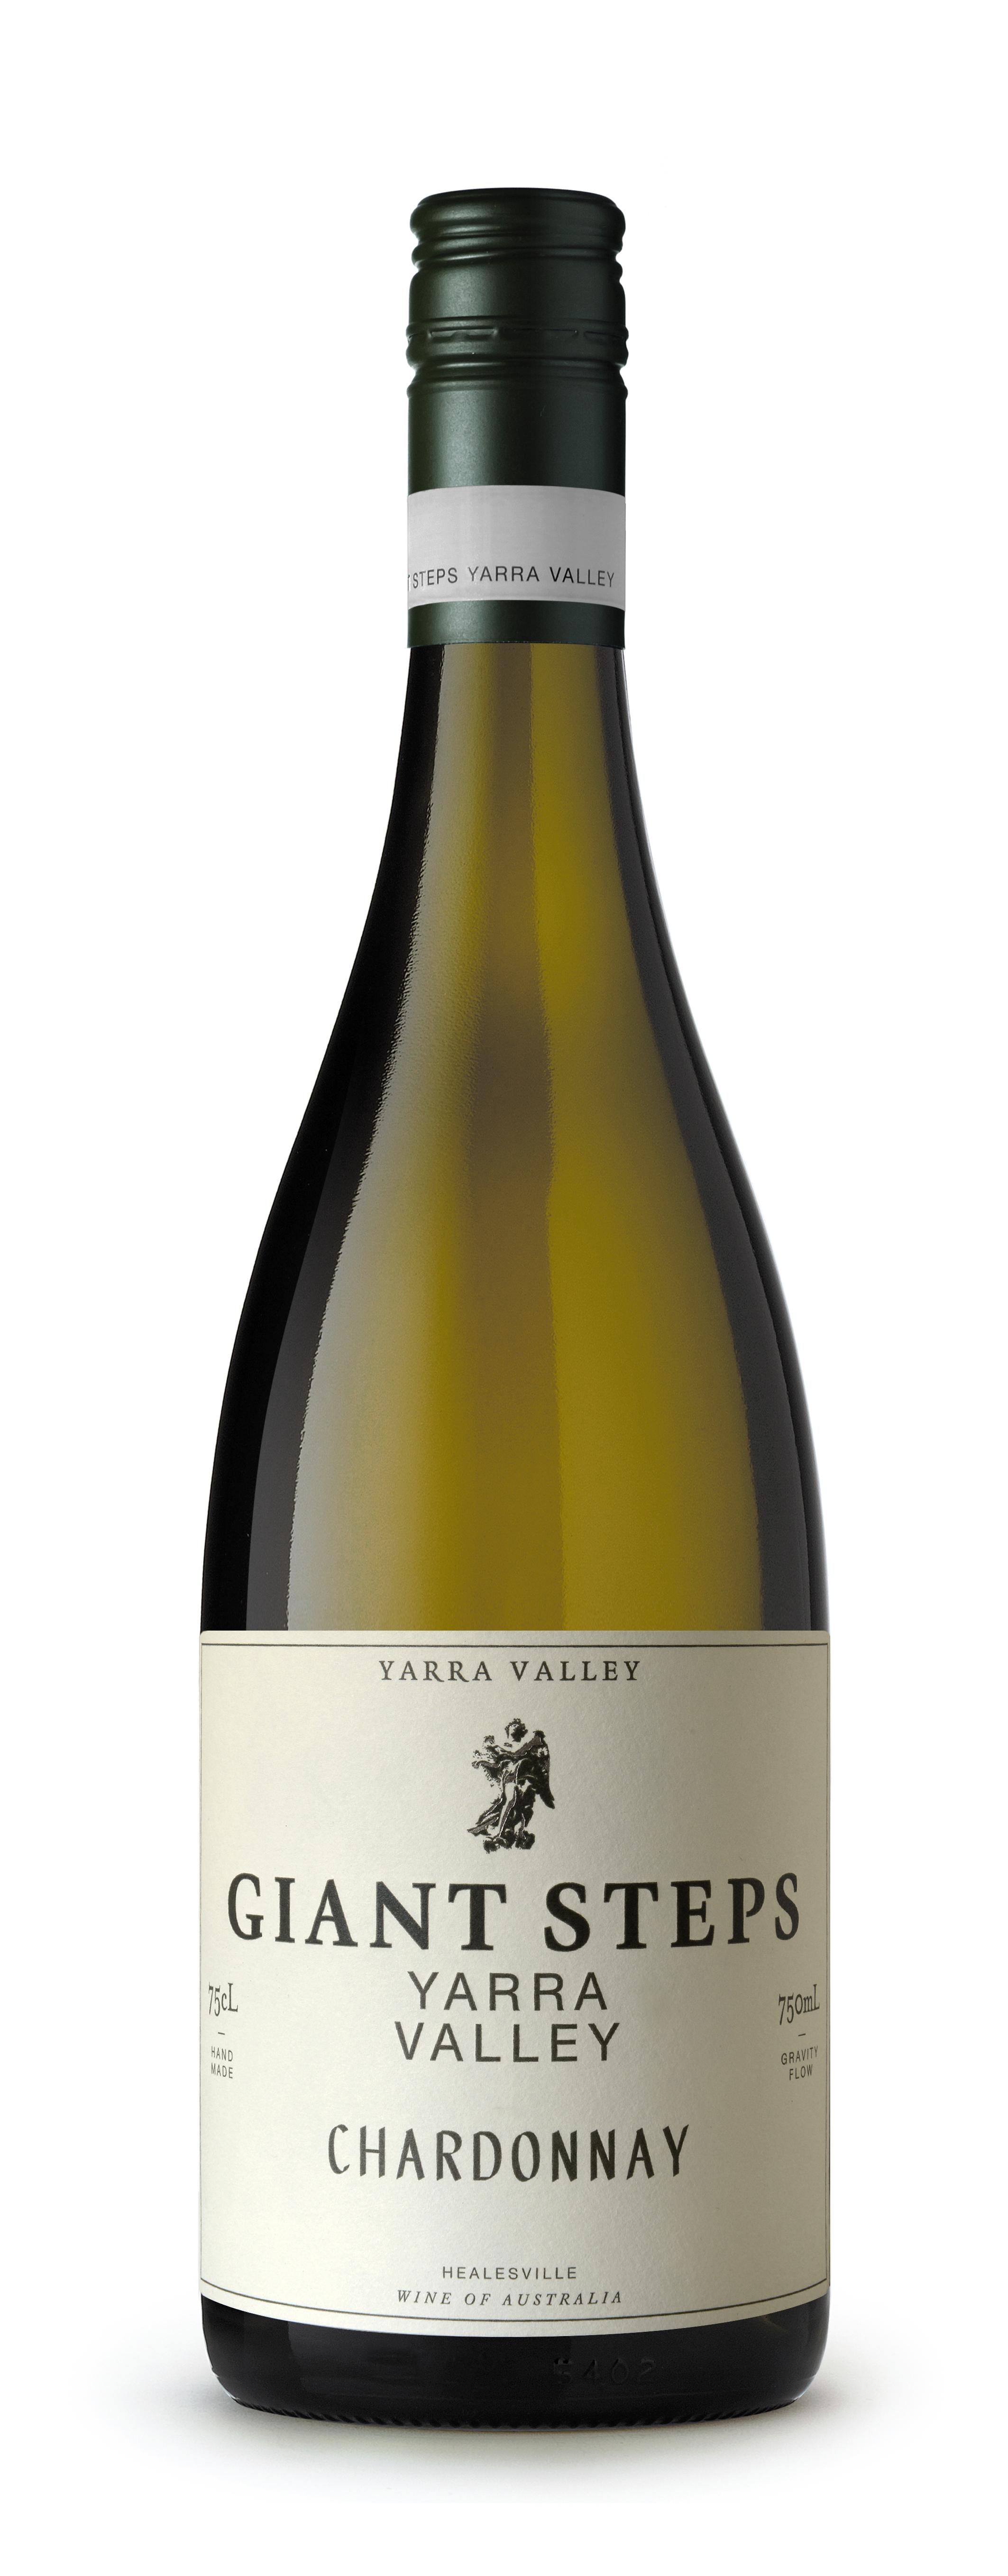 Giant Steps, Yarra Valley Chardonnay 2016